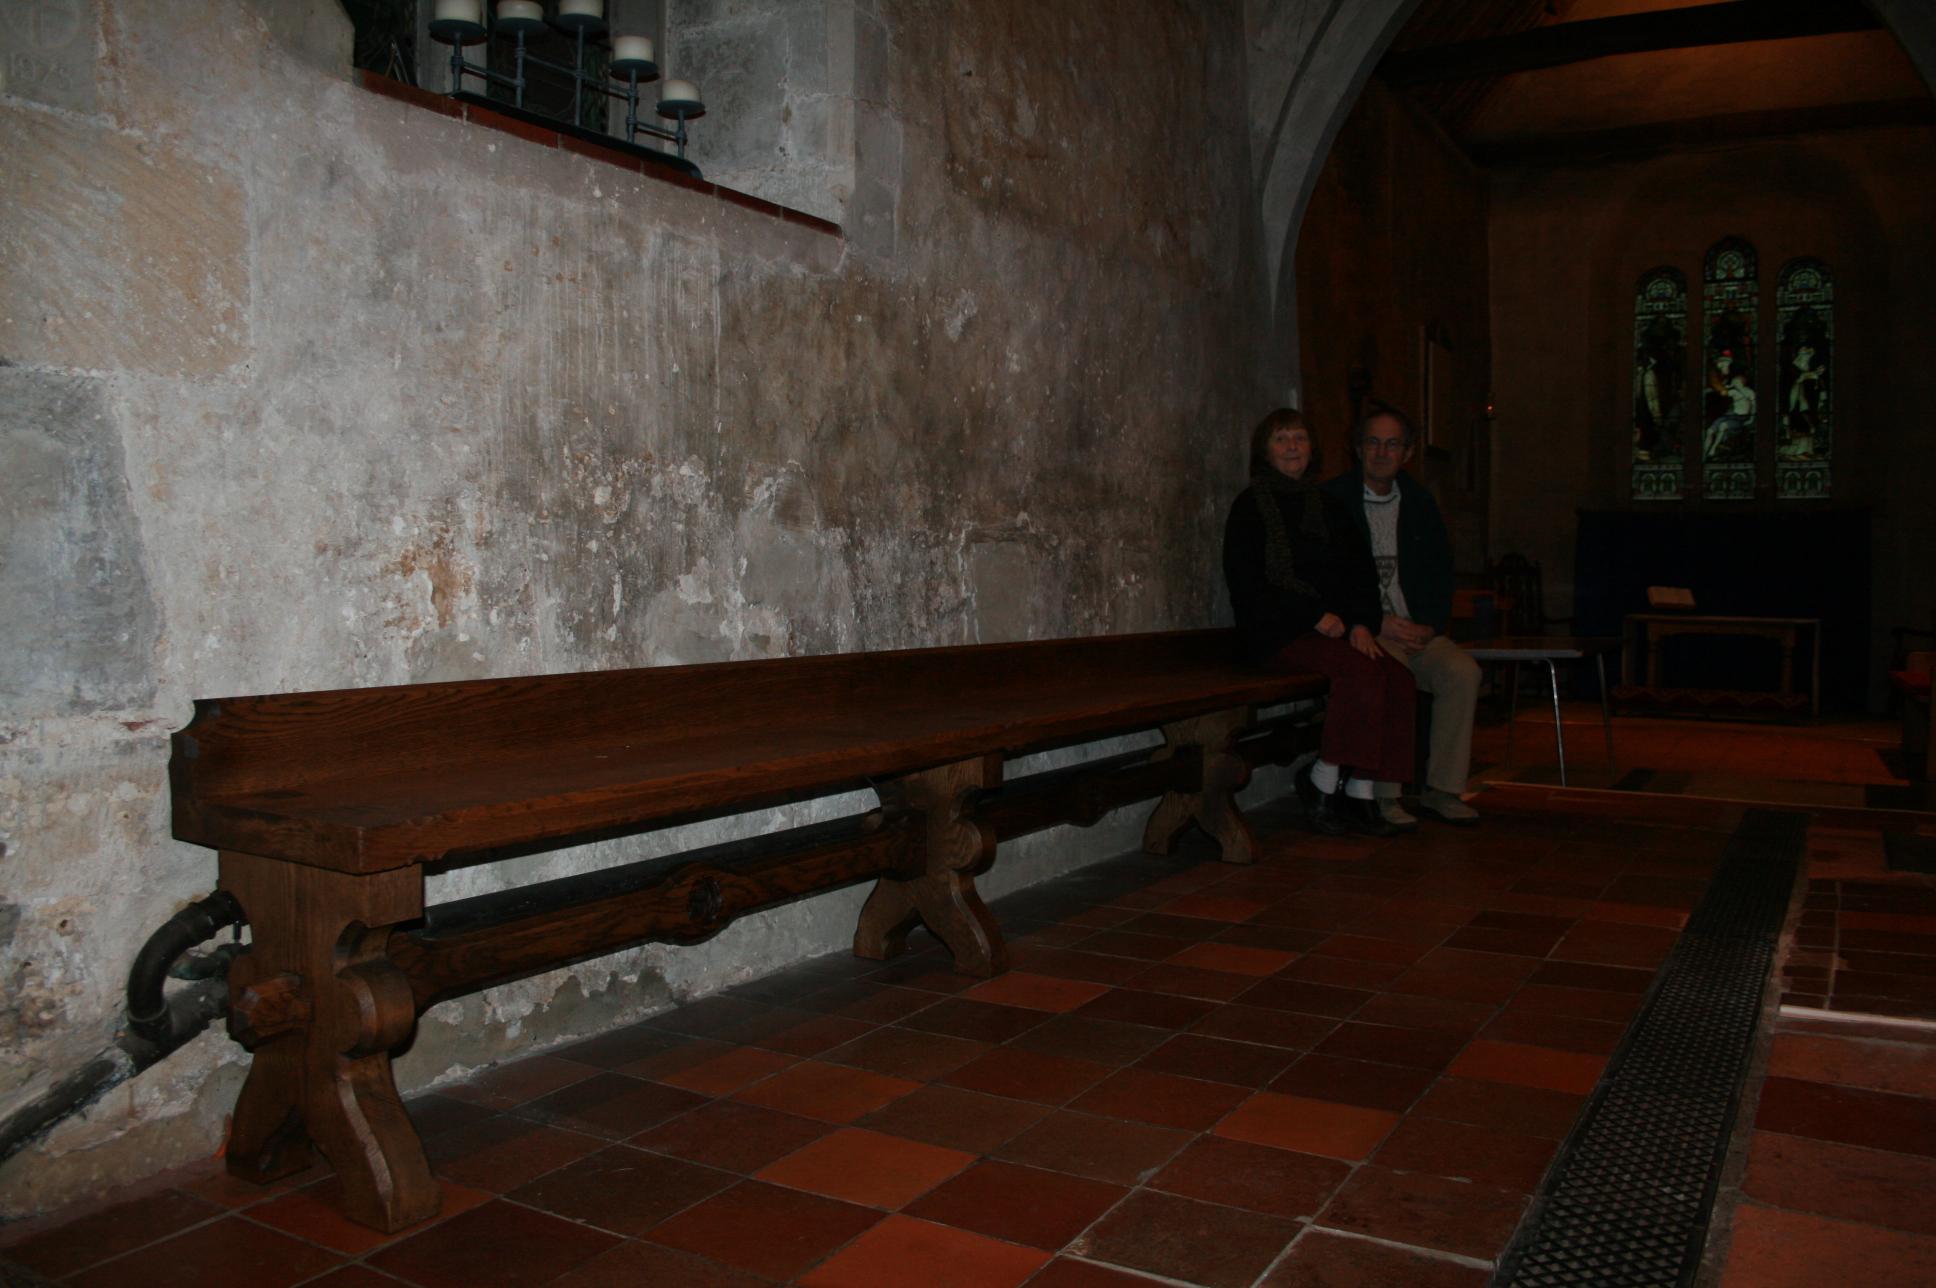 5 CHURCH BENCH .JPG